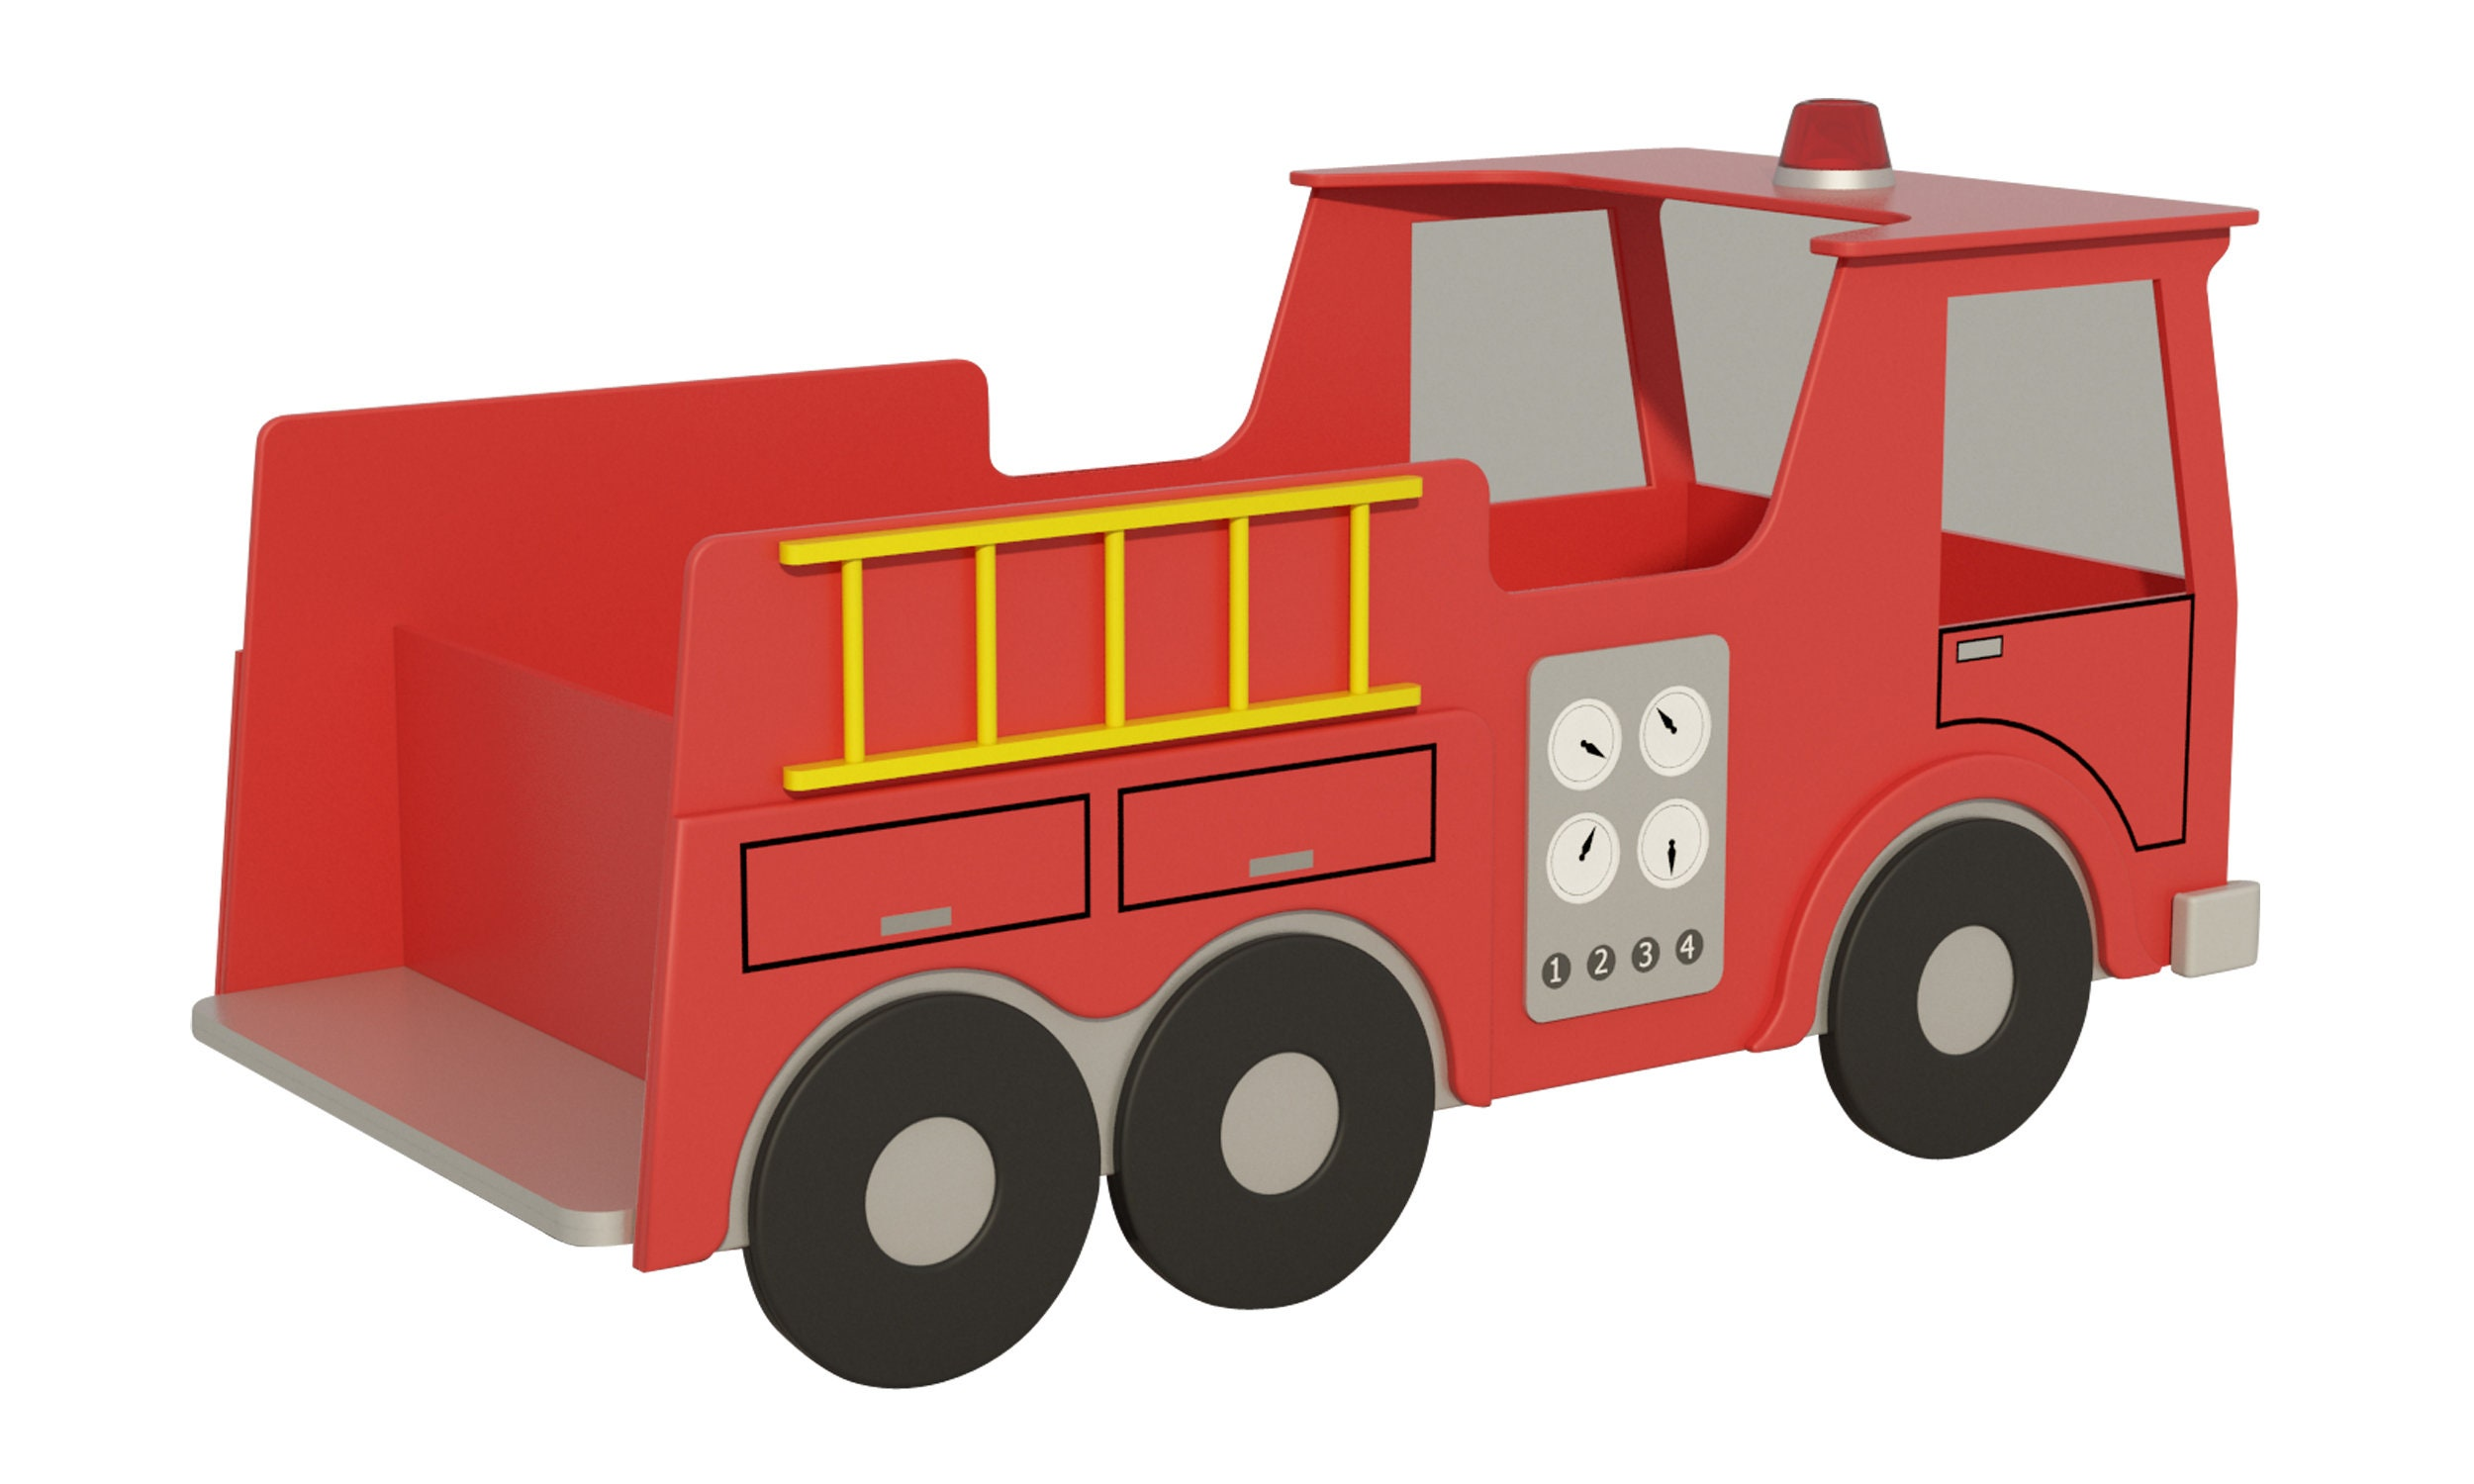 Fire Truck Kids Bed Plans DIY Child Single Bed Bedroom | Etsy